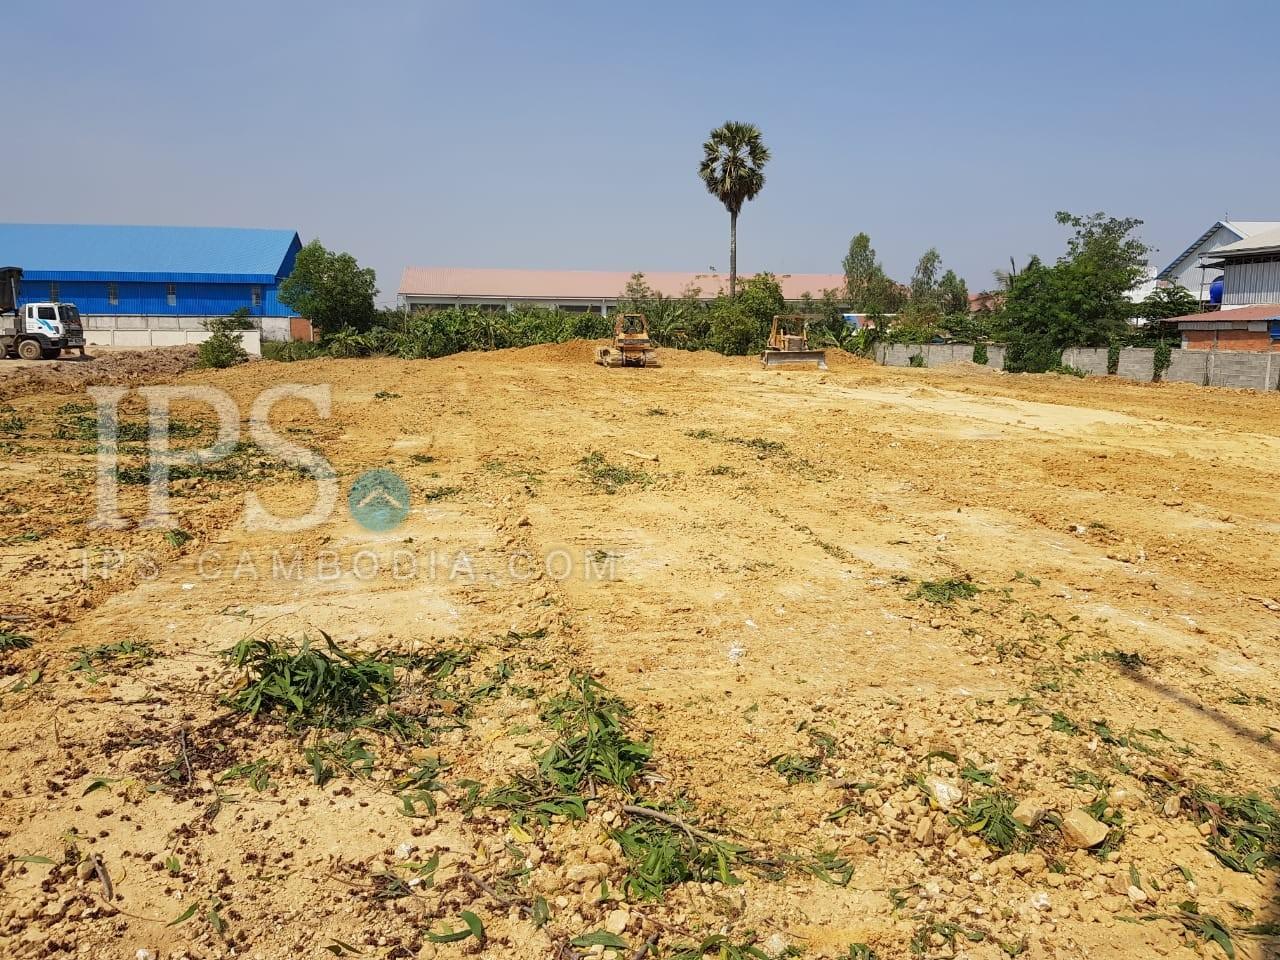 3,079 Sqm Land For Lease - Preak Kampues, Phnom Penh